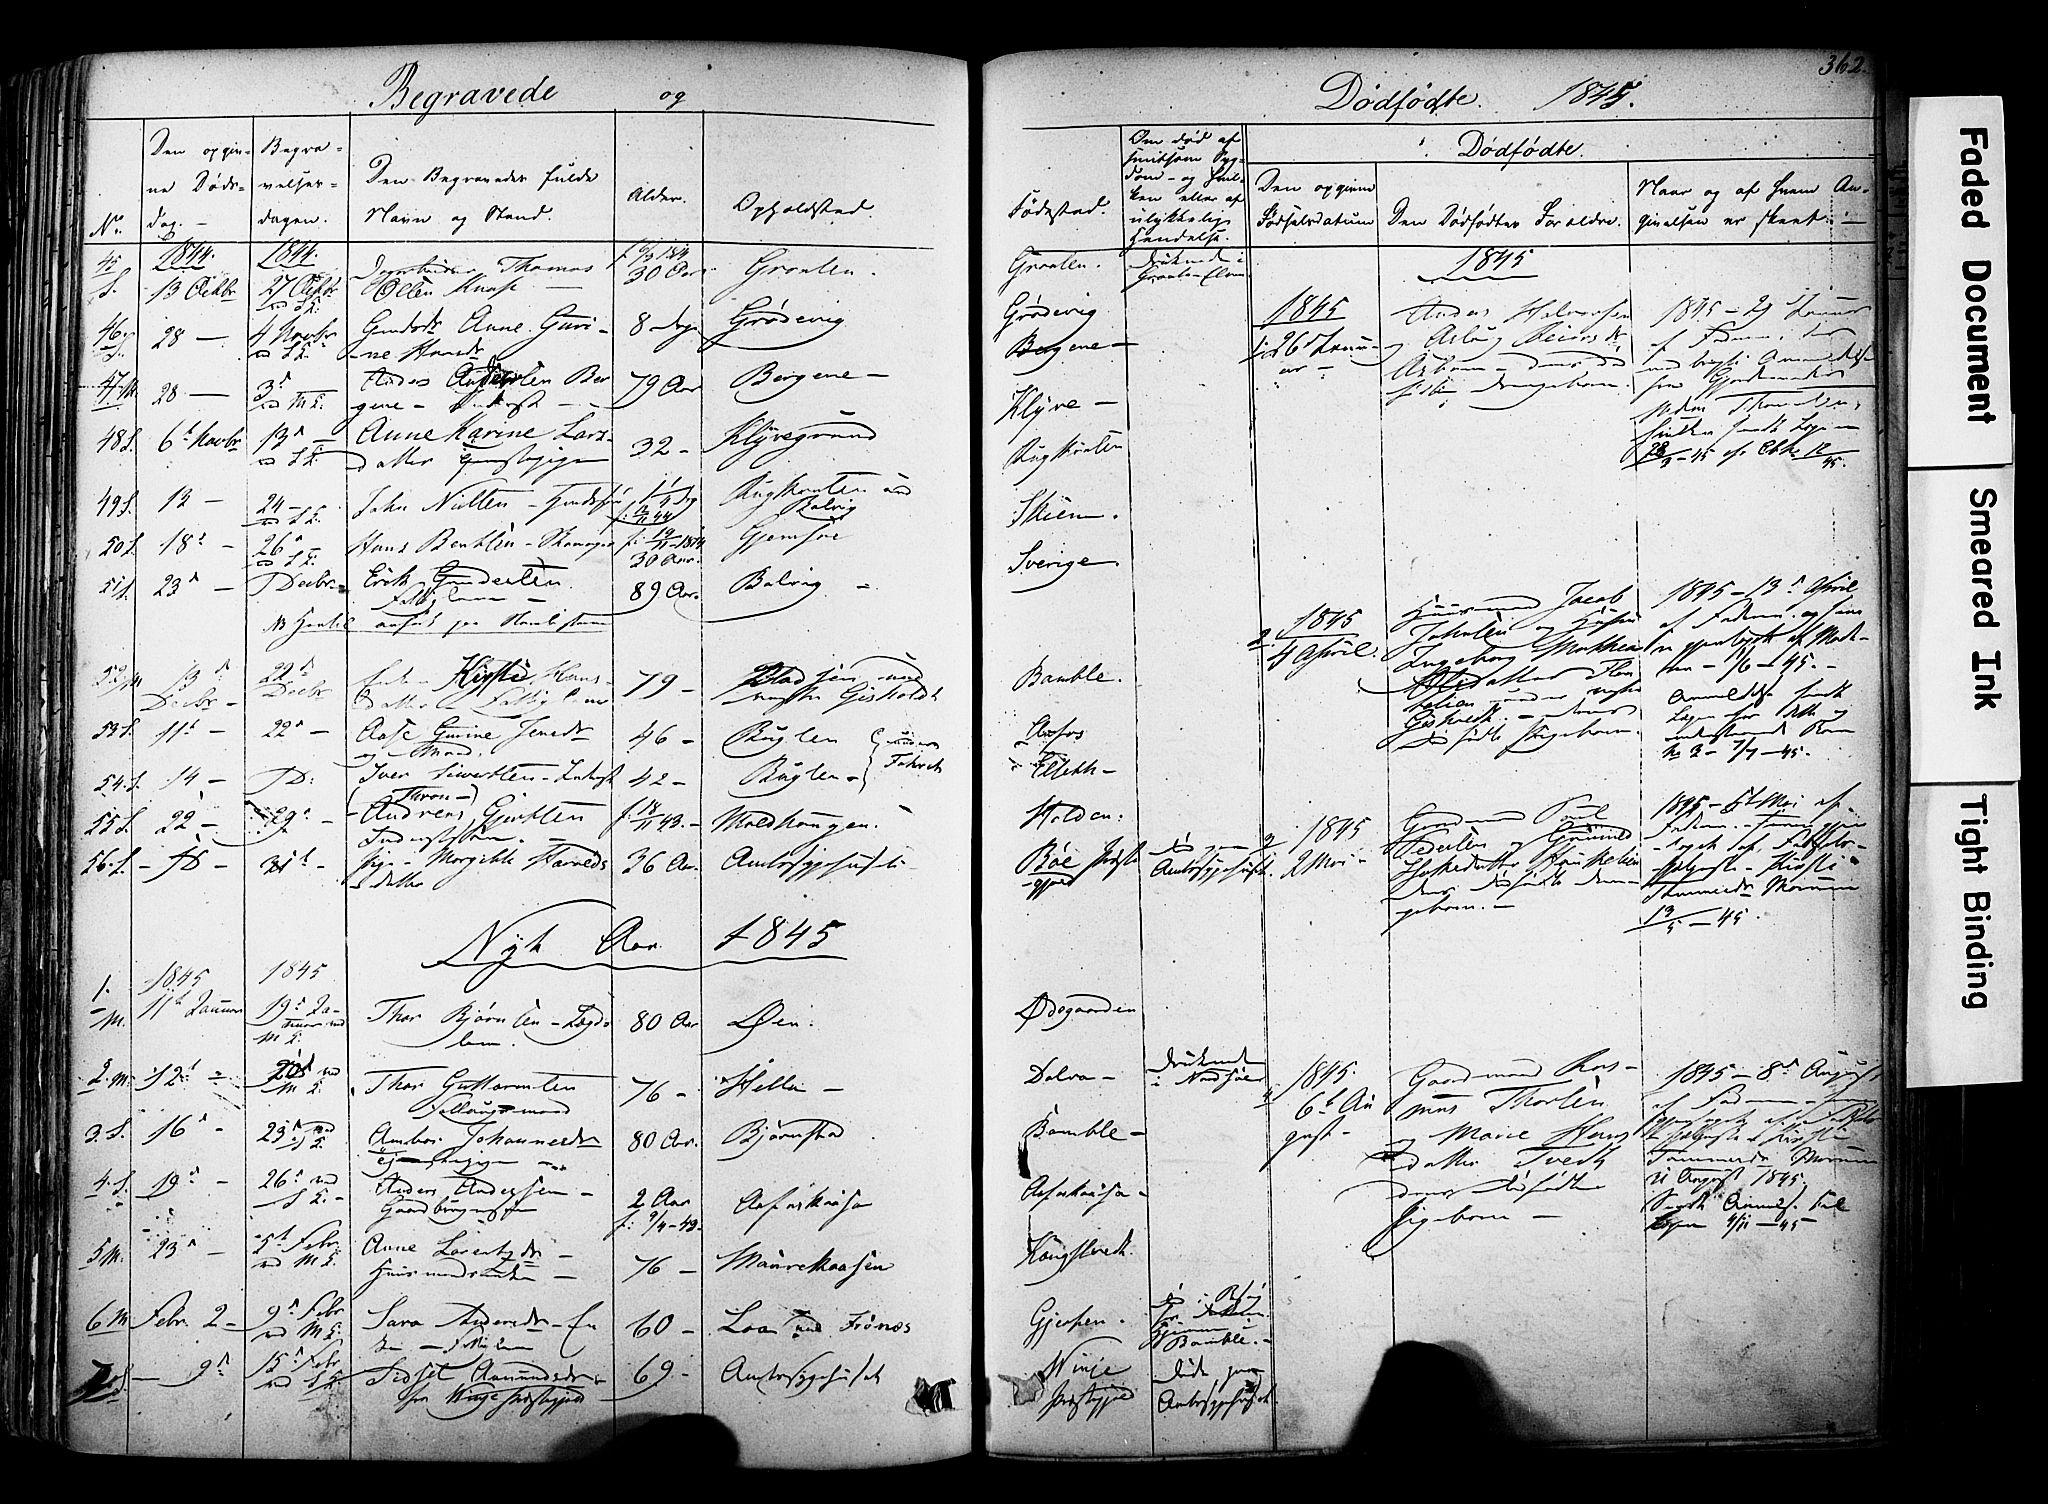 SAKO, Solum kirkebøker, F/Fa/L0006: Ministerialbok nr. I 6, 1844-1855, s. 362